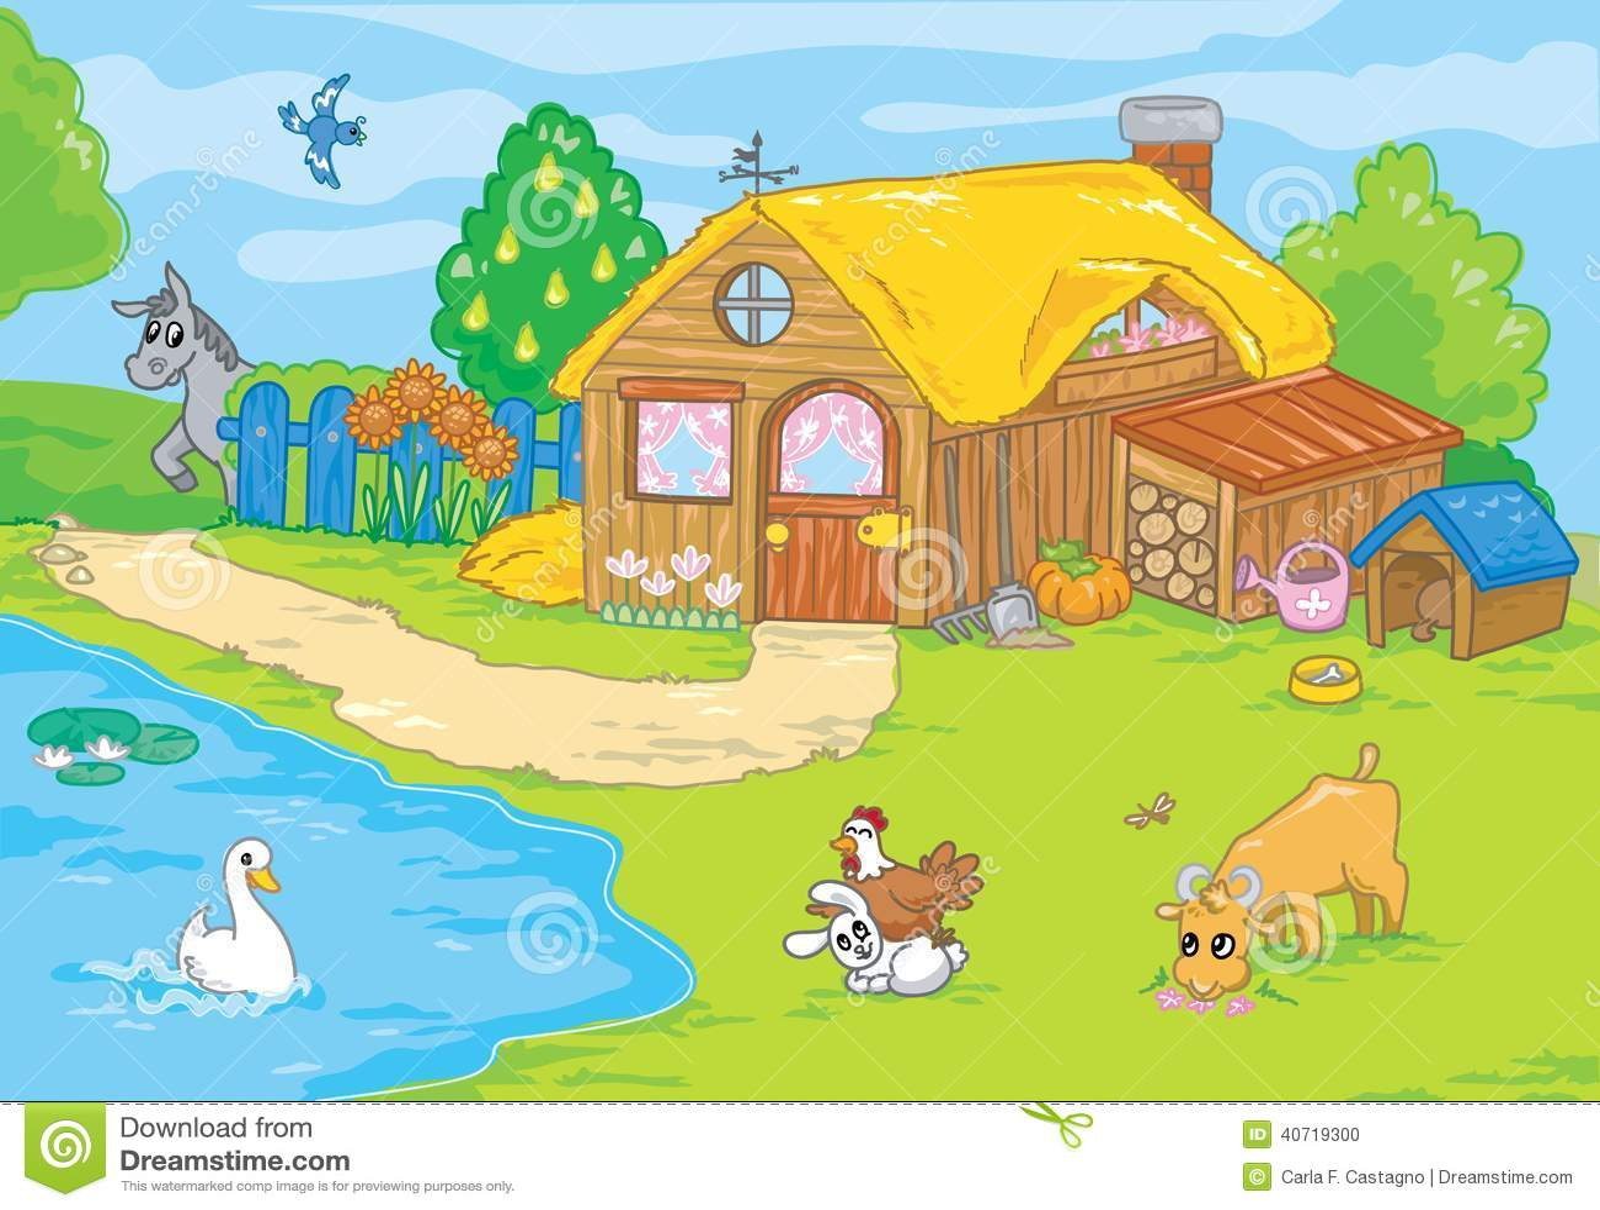 Rabbit Duck House Plans on rabbit beauty, rabbit engineering, rabbit condo, rabbit runs product, rabbit houses outdoor, rabbit hutch, rabbit blueprints, rabbit runs and houses, rabbit fart, rabbit pens, rabbit glass, rabbit playground, rabbit couple, snare trap plans, rabbit houses and sleeping quarters, rabbit making a home, rabbit cages, rabbit shit, rabbit housing,